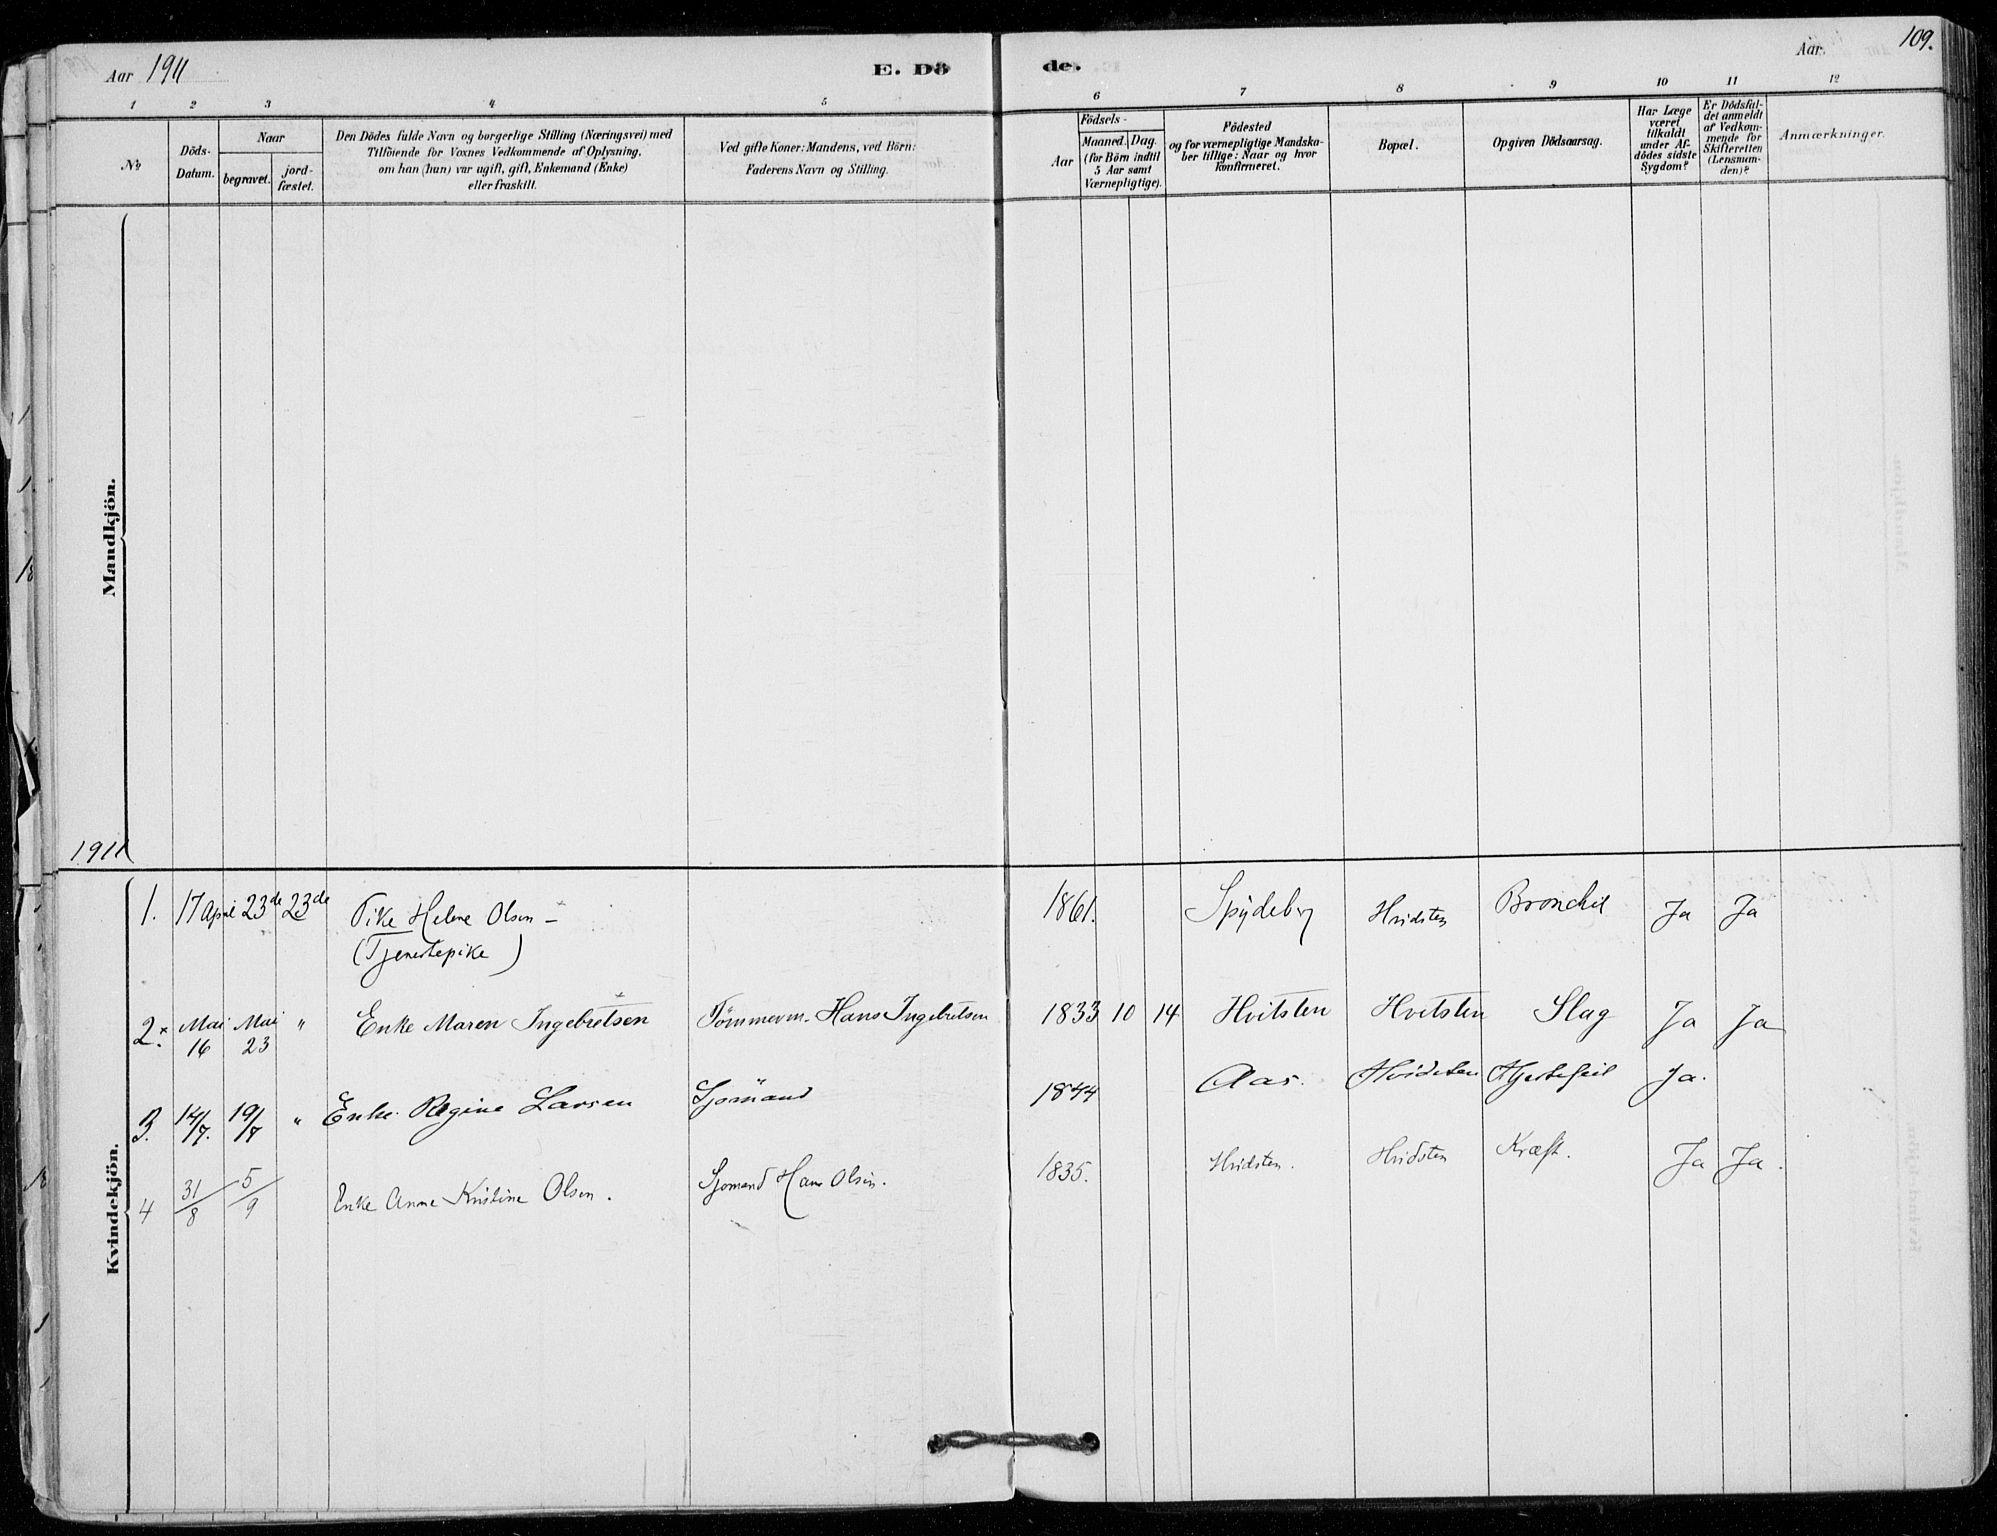 SAO, Vestby prestekontor Kirkebøker, F/Fd/L0001: Ministerialbok nr. IV 1, 1878-1945, s. 109